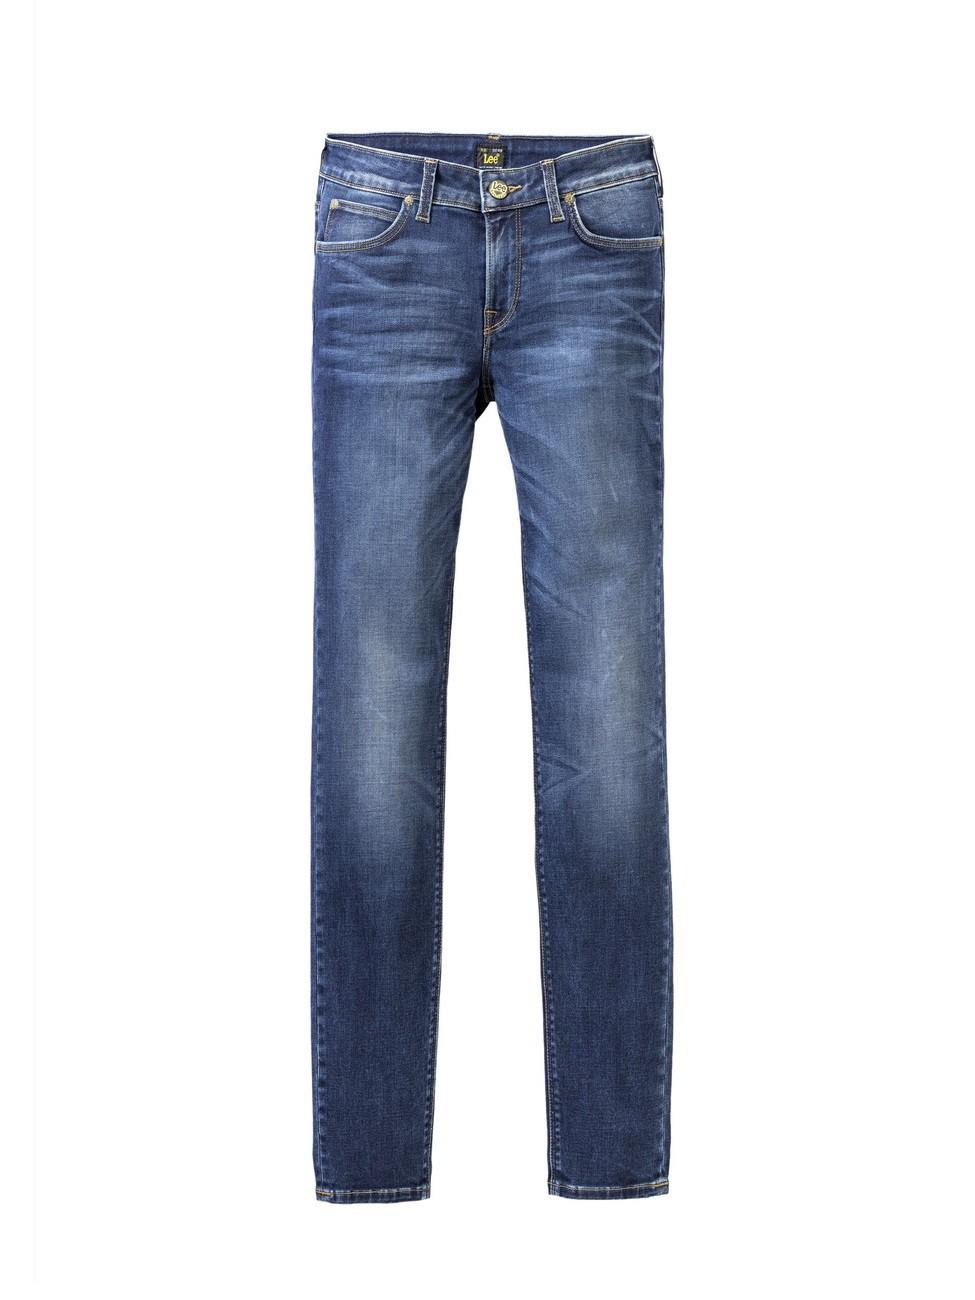 lee damen jeans marion l301swwq high waist straight leg. Black Bedroom Furniture Sets. Home Design Ideas